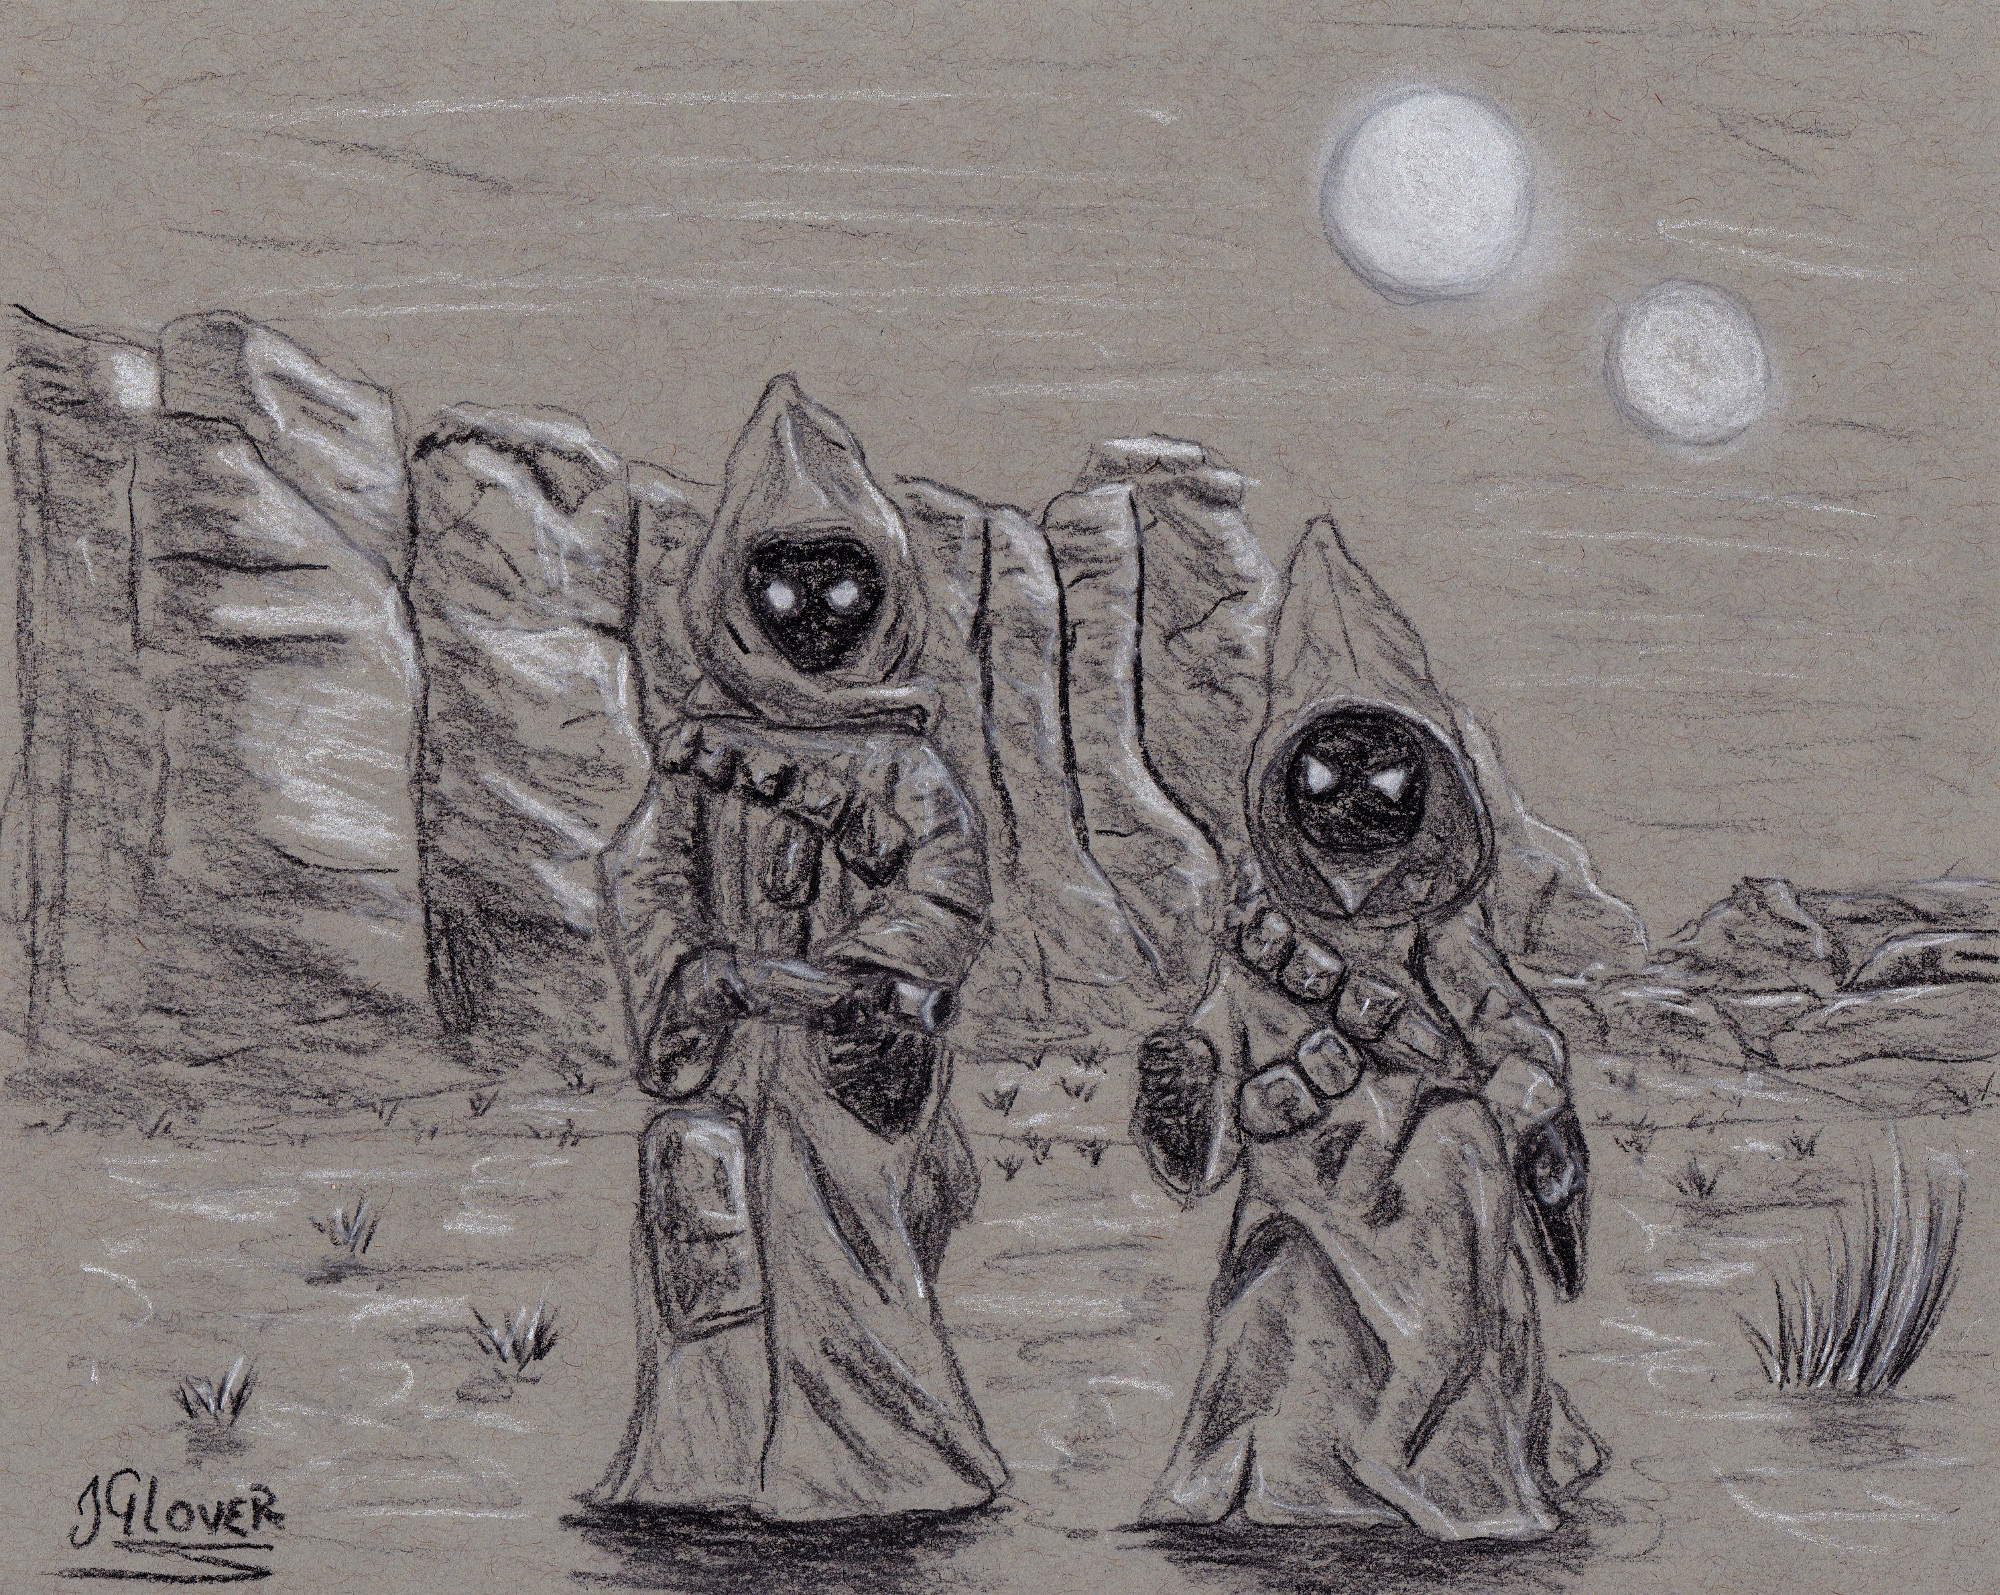 jawas - tatooine - star wars - illustration - art - charcoal - drawing